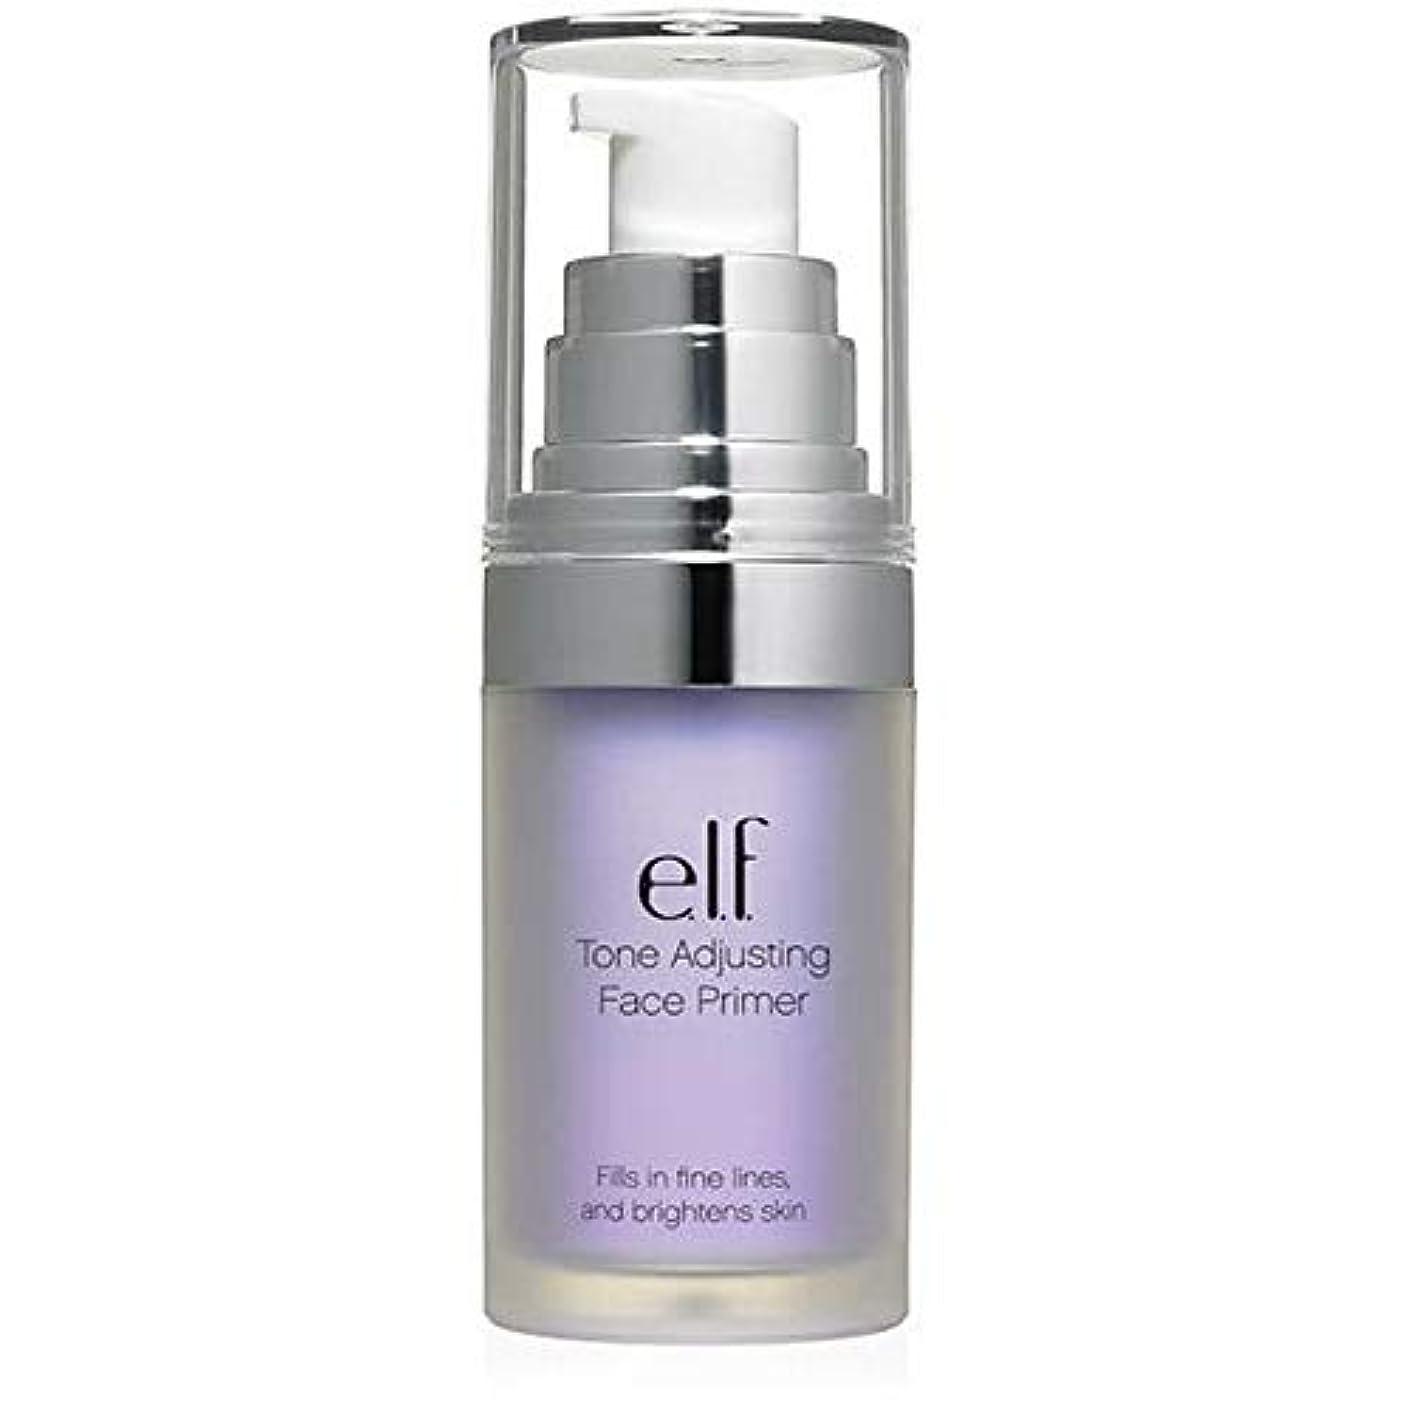 [Elf ] エルフ。ラベンダー403を明るくトーン調整顔プライマー - e.l.f. Tone Adjusting Face Primer Brightening Lavender 403 [並行輸入品]